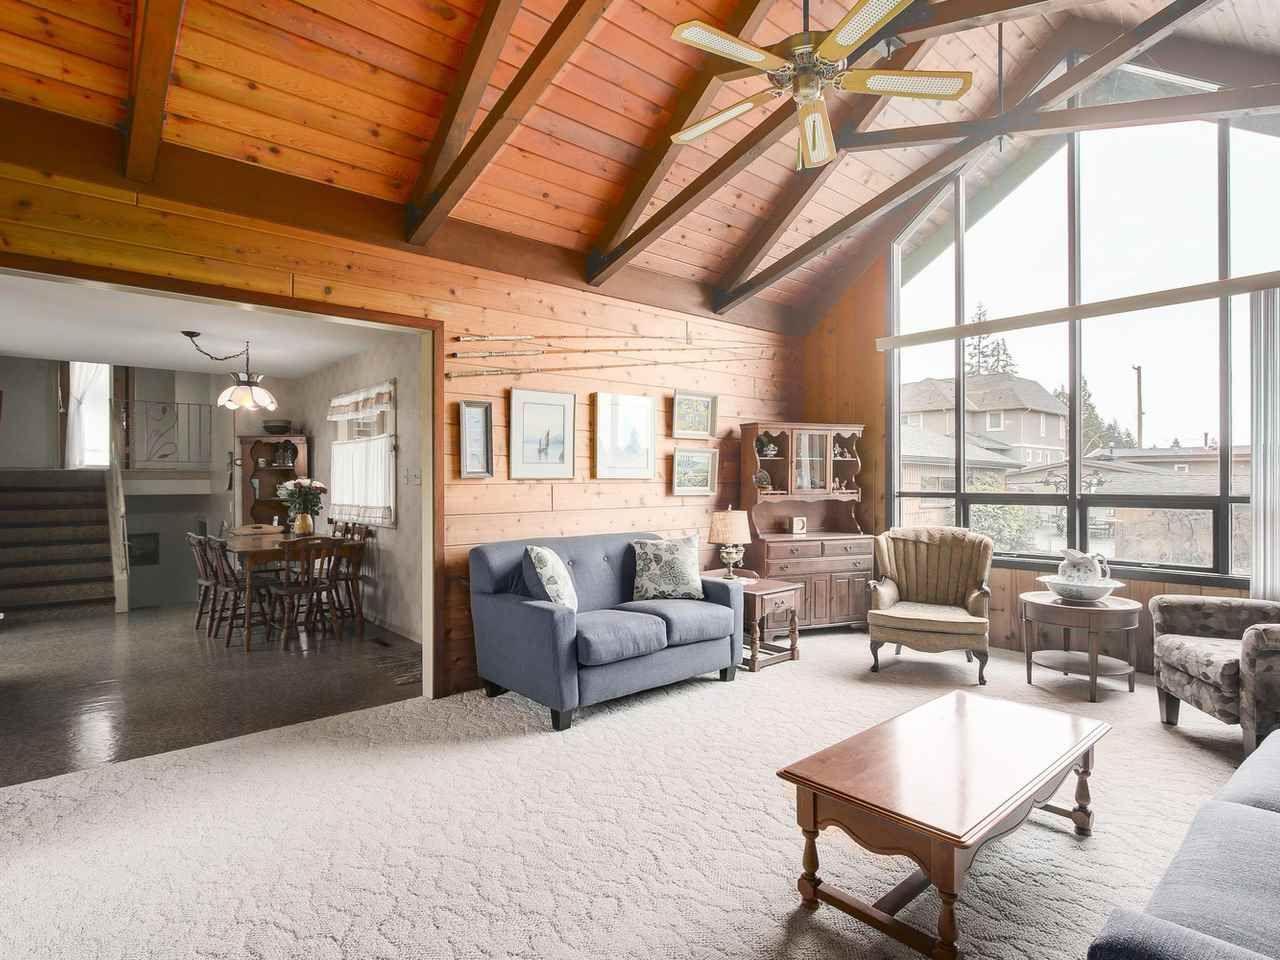 Photo 3: Photos: 1320 REGAN Avenue in Coquitlam: Central Coquitlam House for sale : MLS®# R2147096